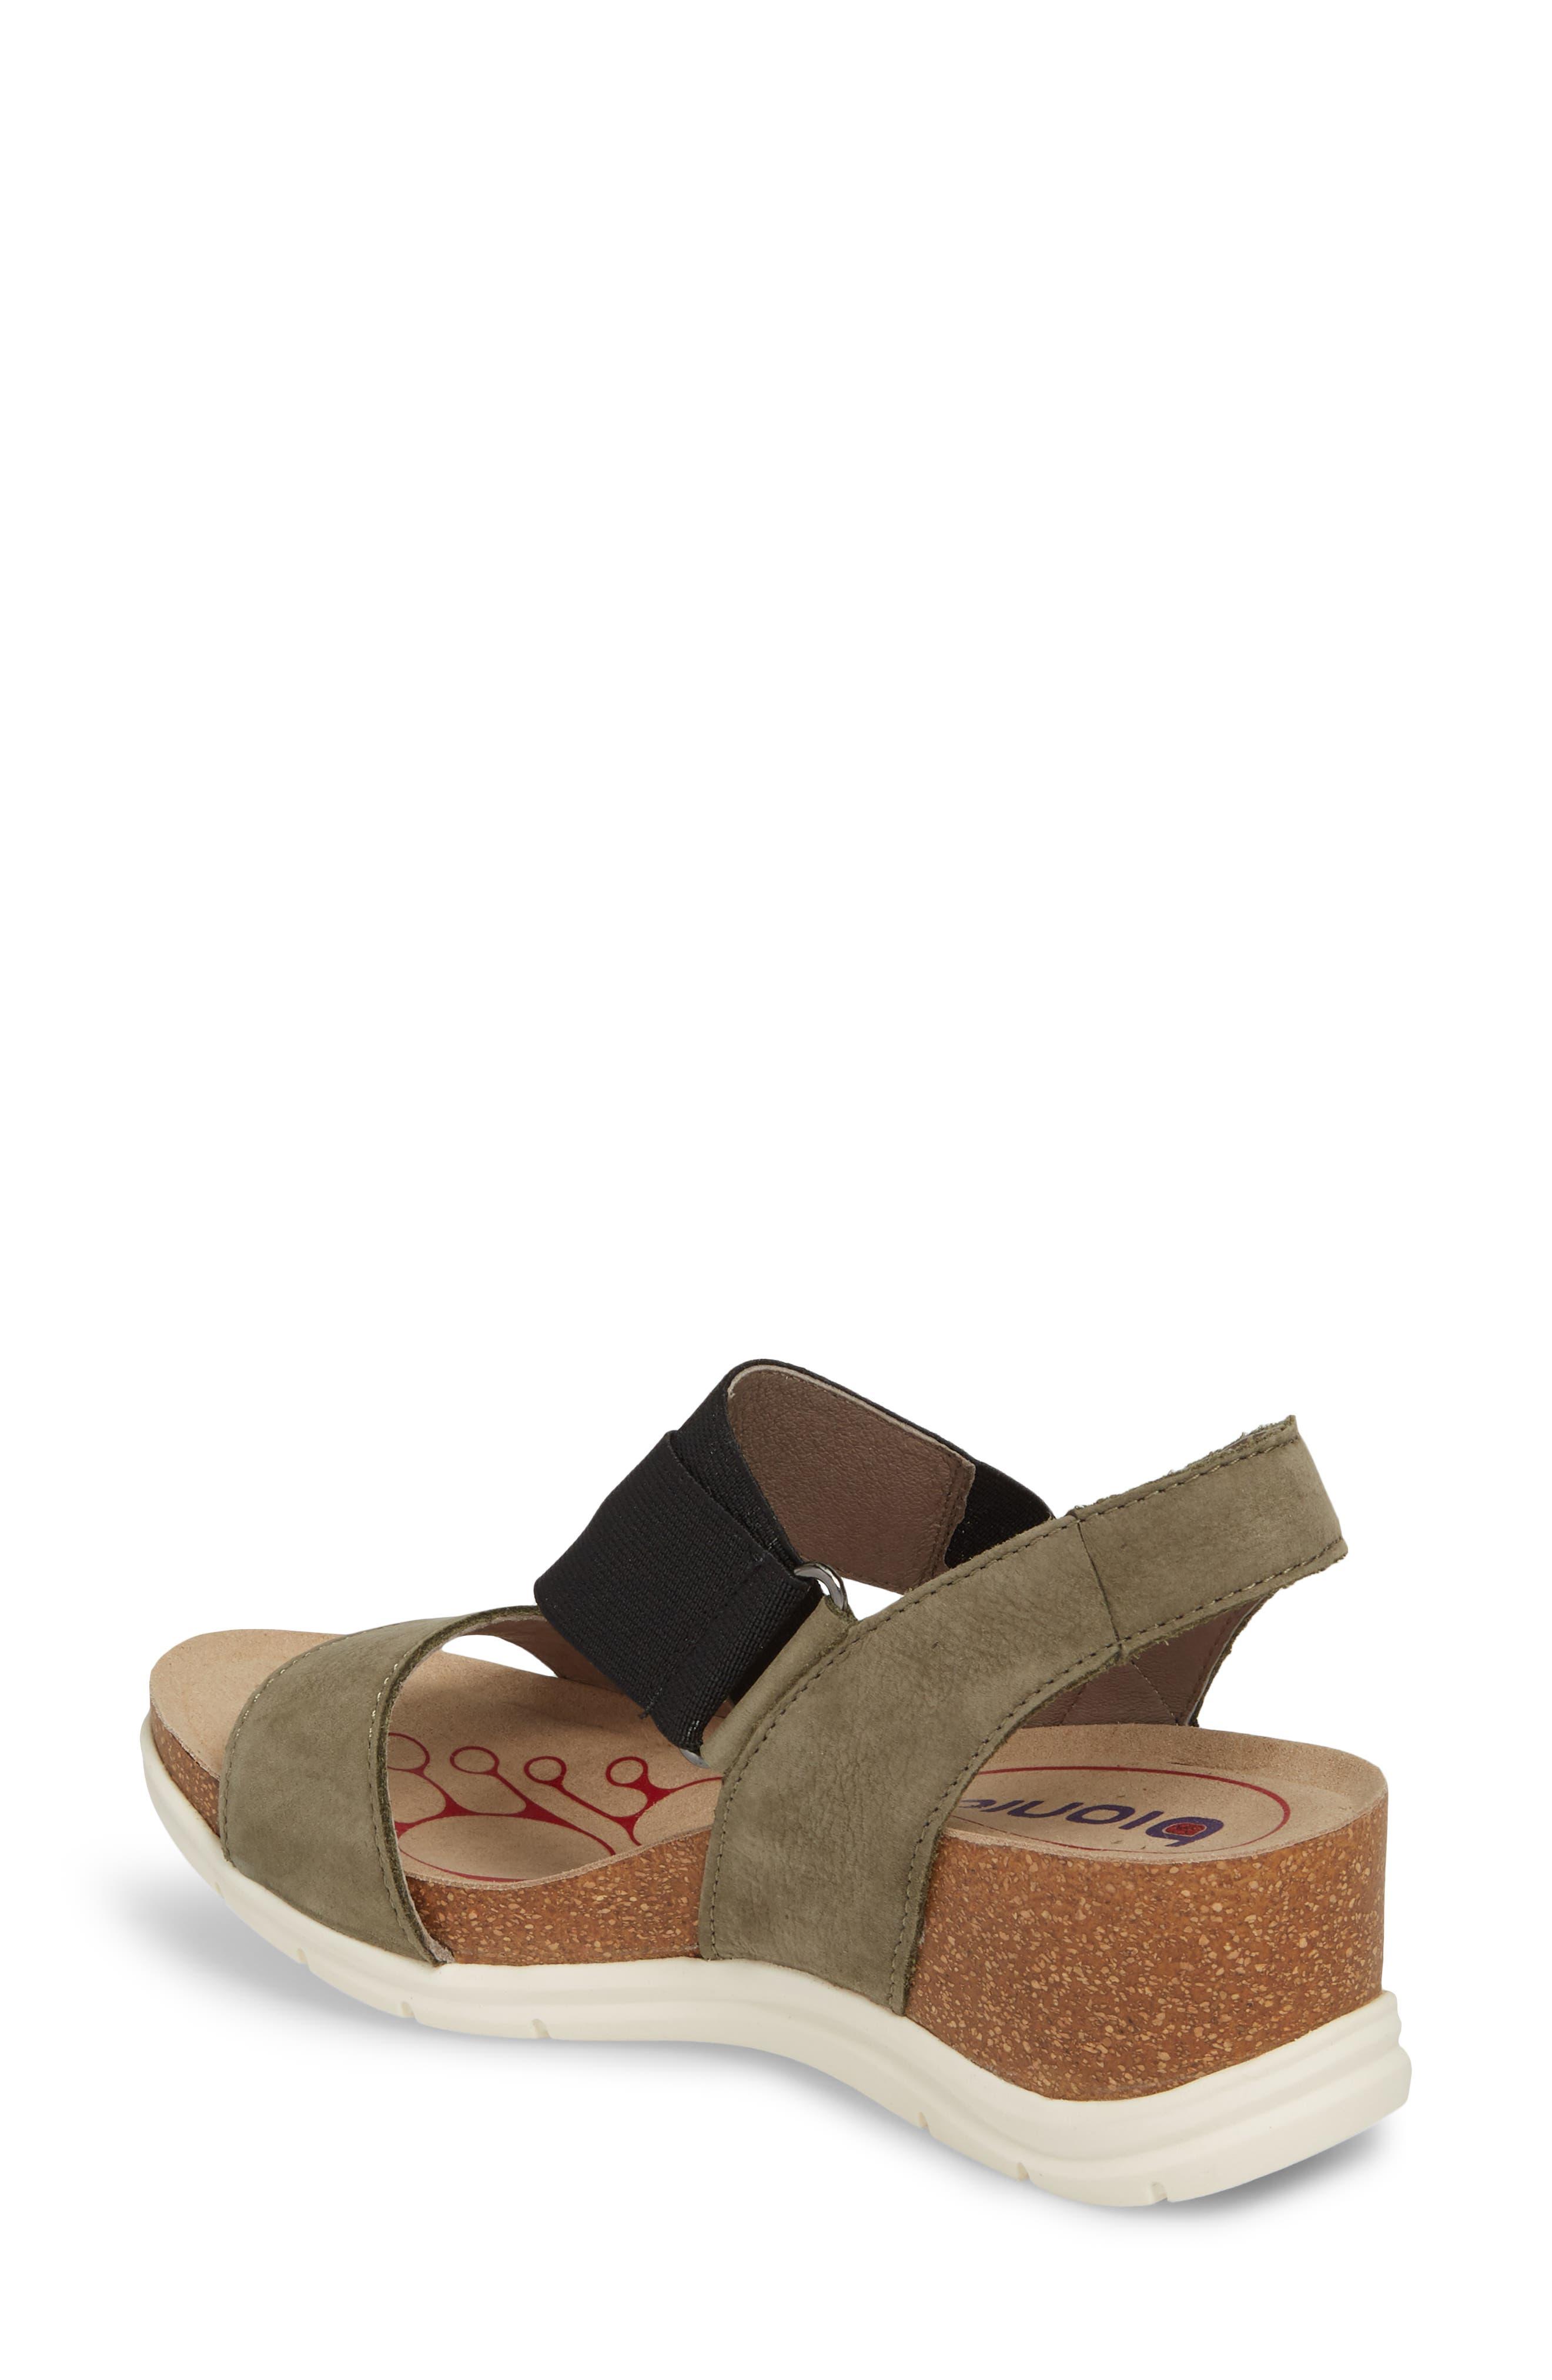 Paisley Wedge Sandal,                             Alternate thumbnail 7, color,